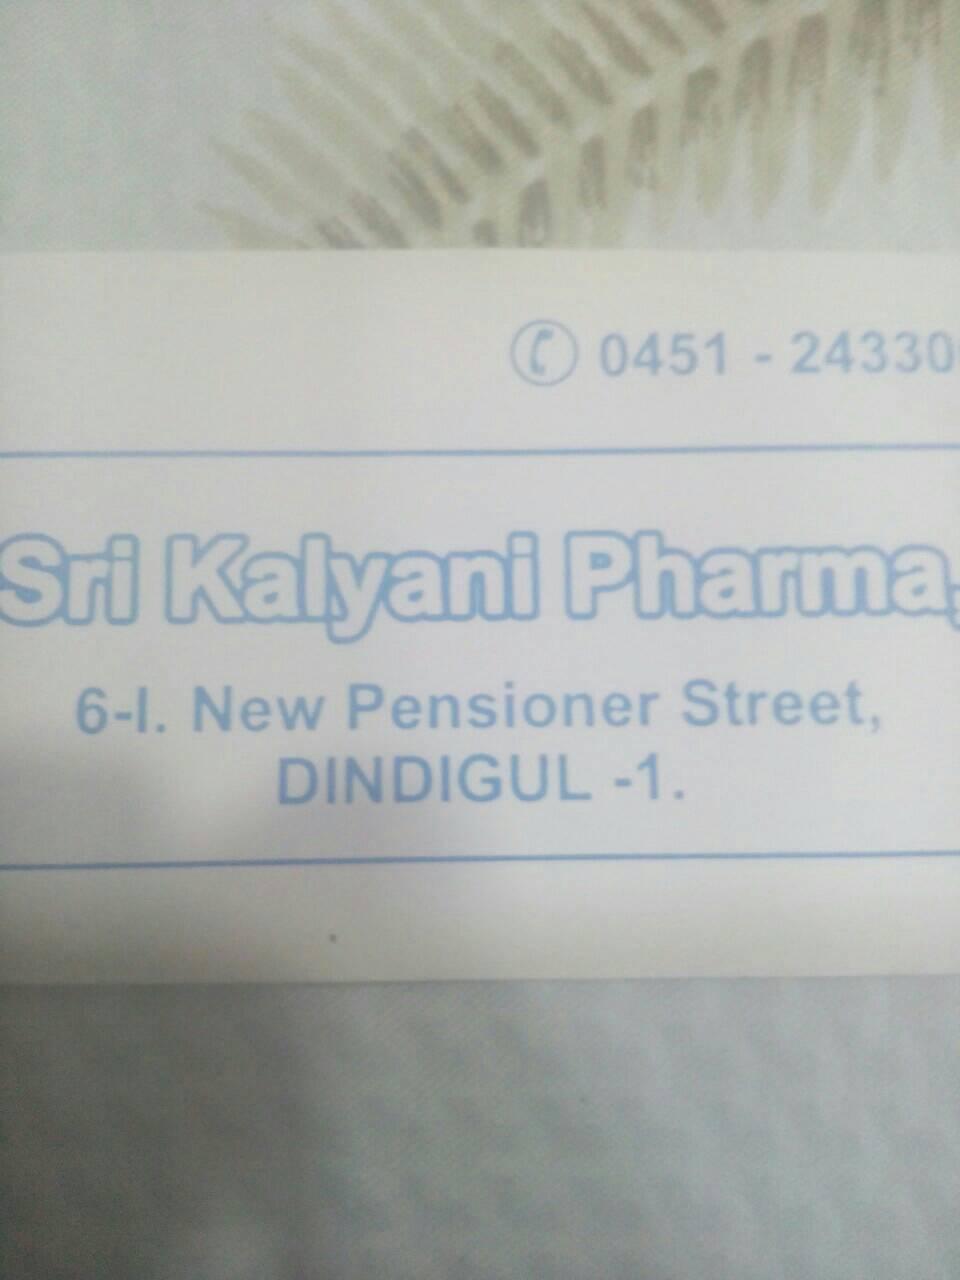 Sri Kalyani Pharma 04512433007